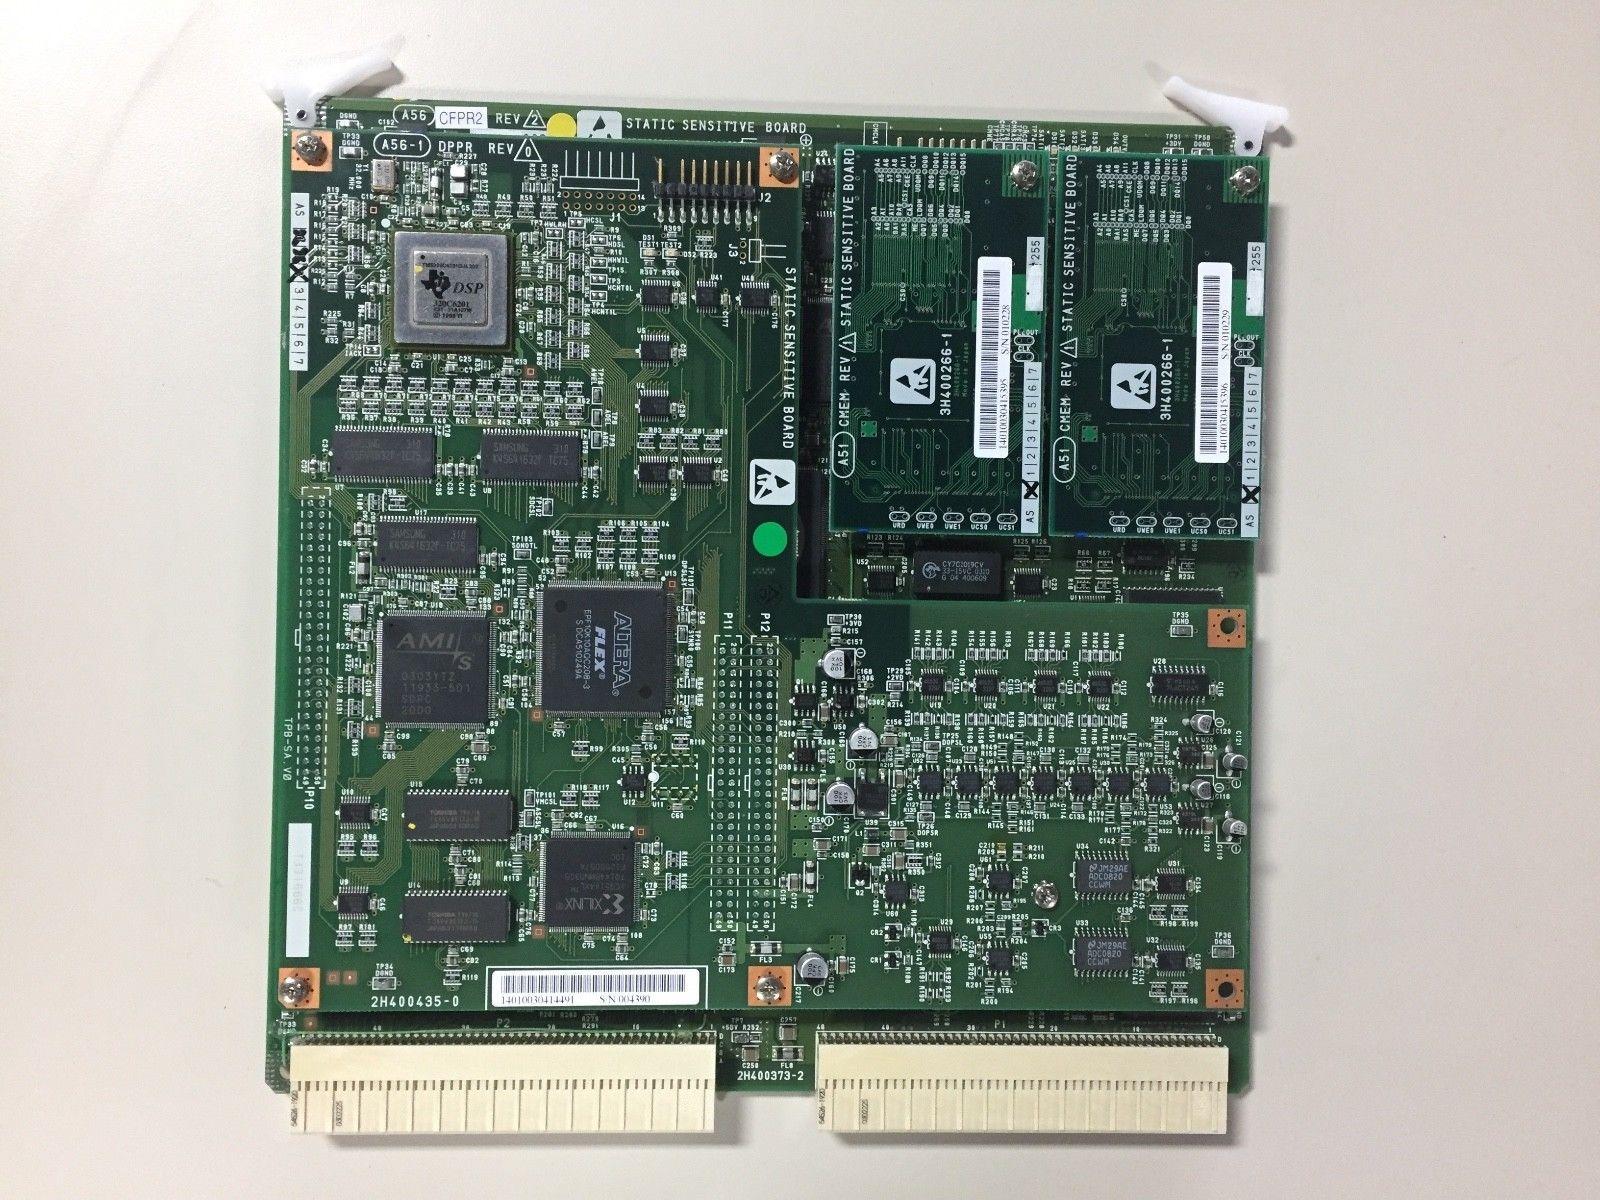 2H400435-0 DPPR BOARD - SIEMENS - ACUSON - CV70